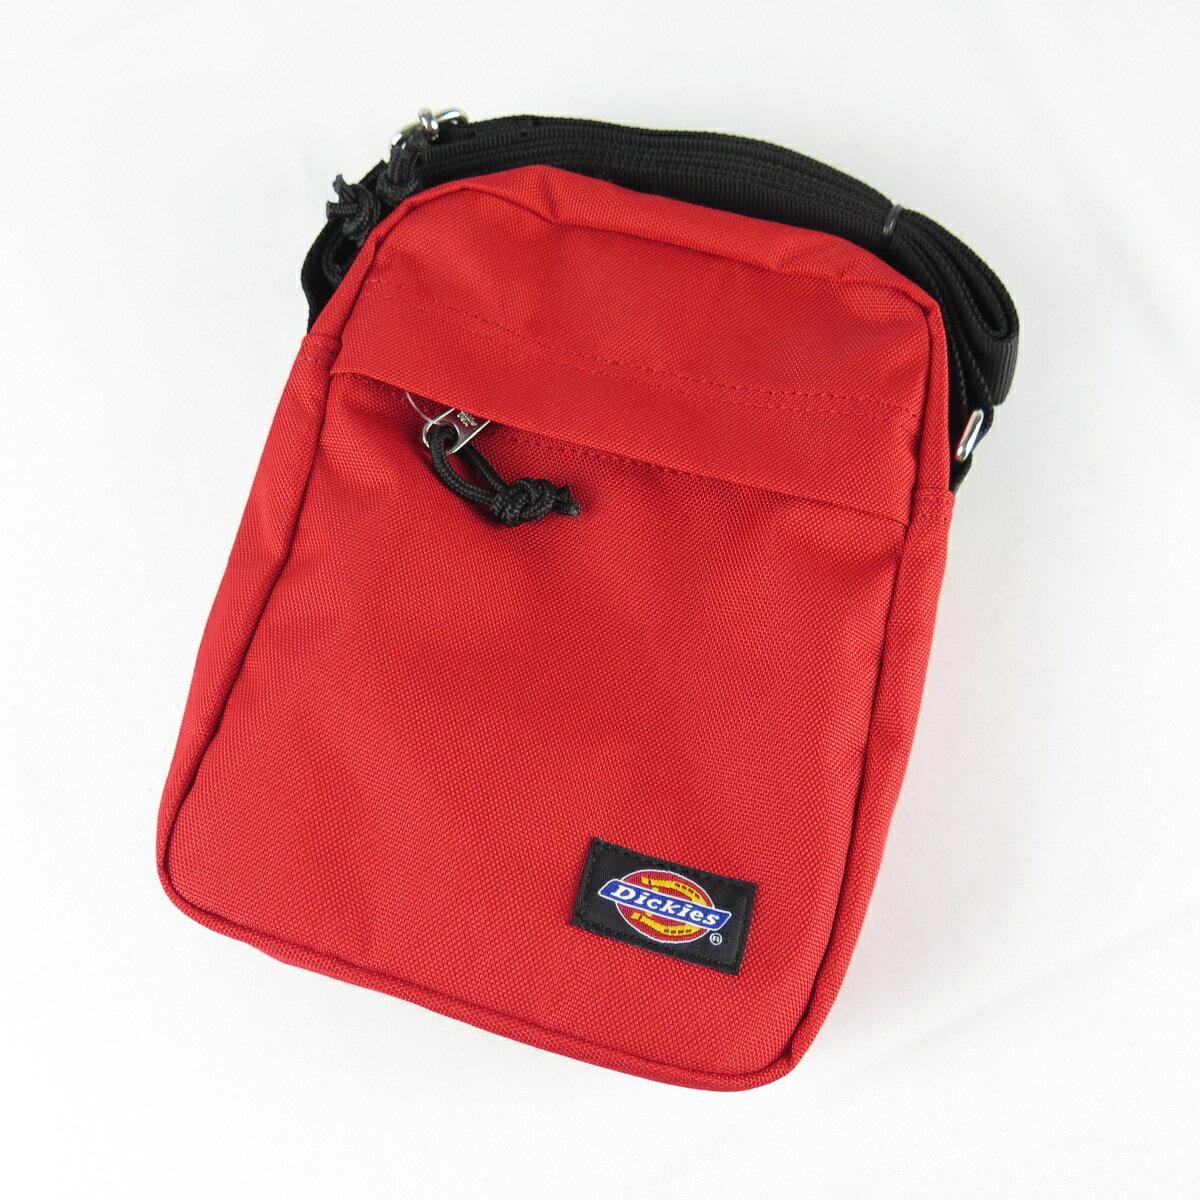 DICKIES 側肩背包 斜背包 正韓 DML5UBSC503R 紅 21X16X5cm【iSport代購】